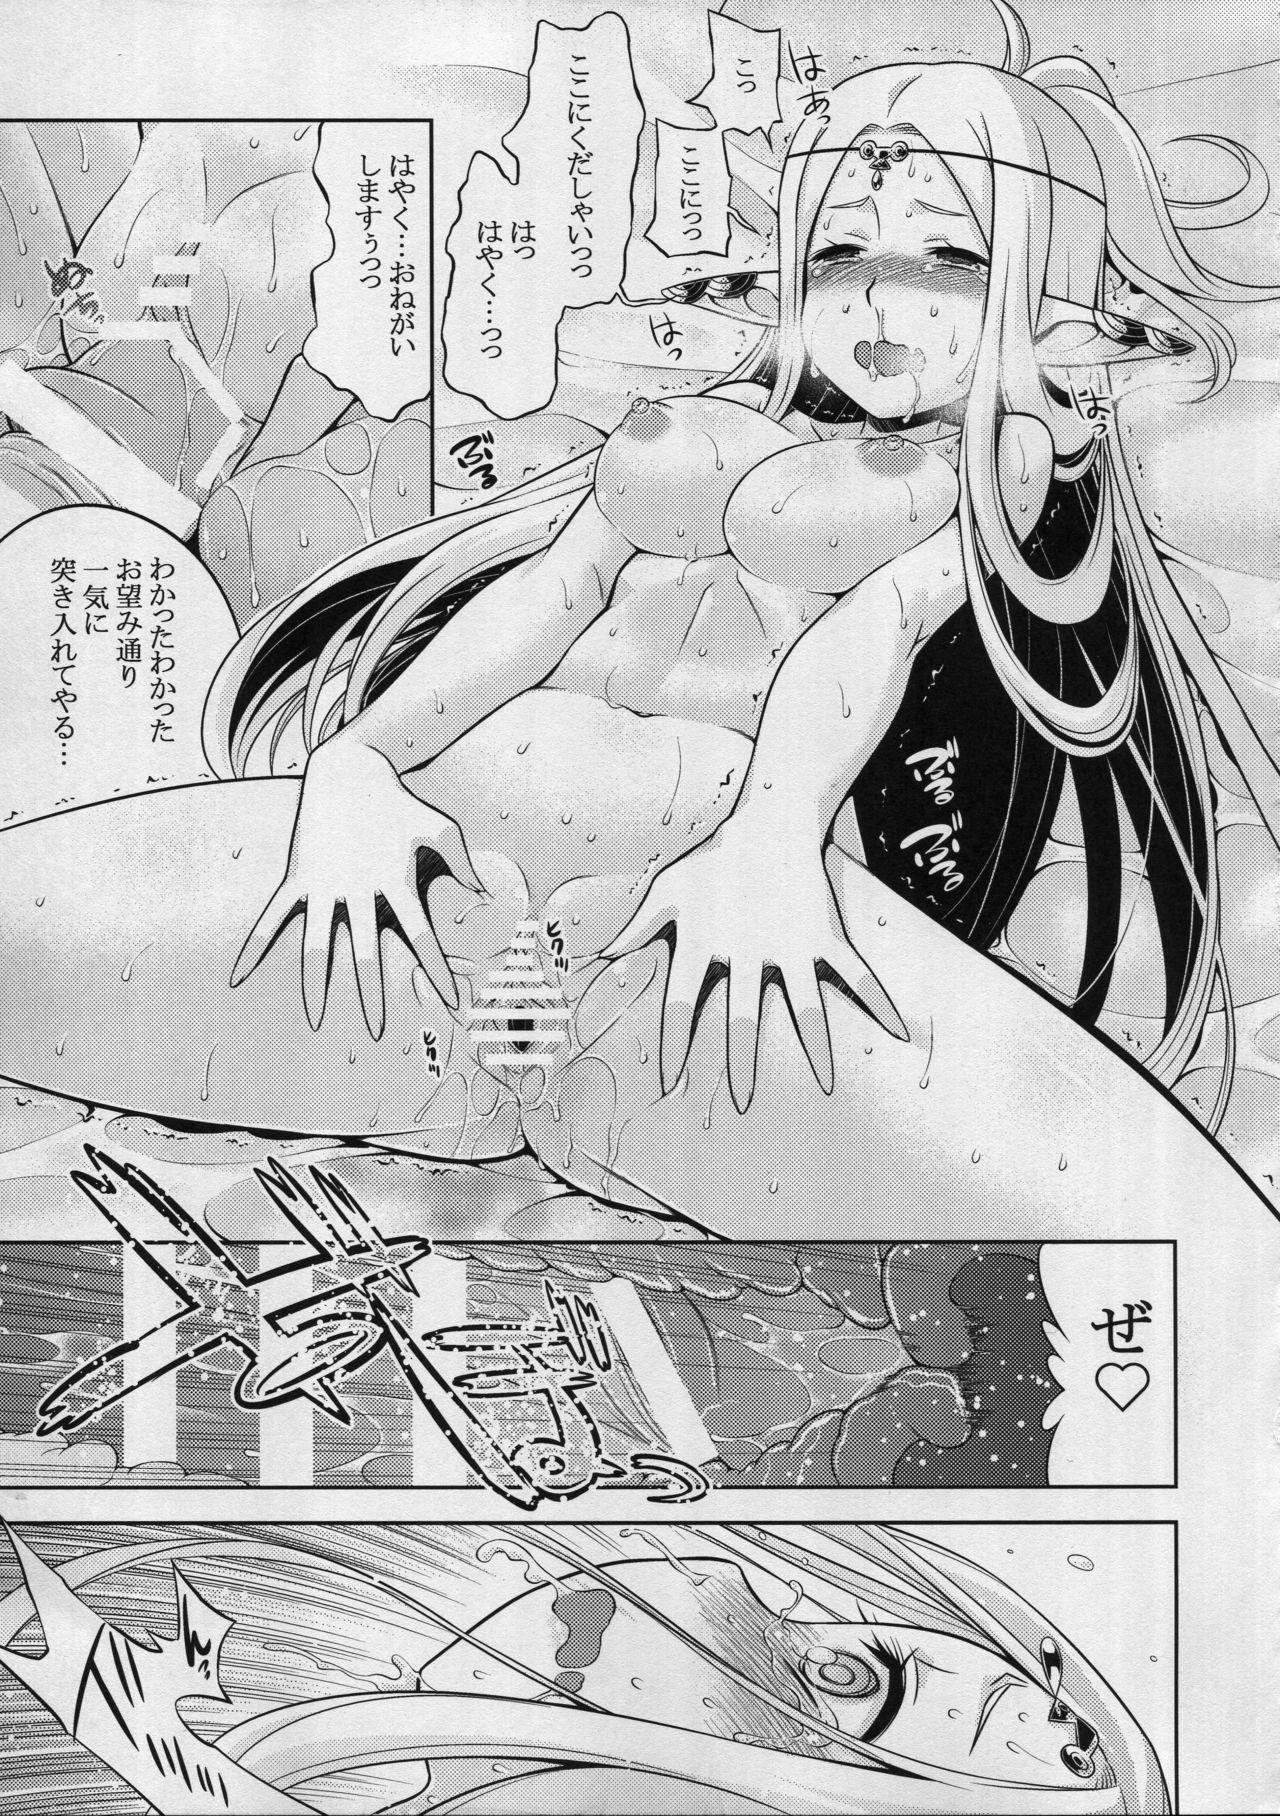 Sekaiju no Anone 28 Kouhen 10